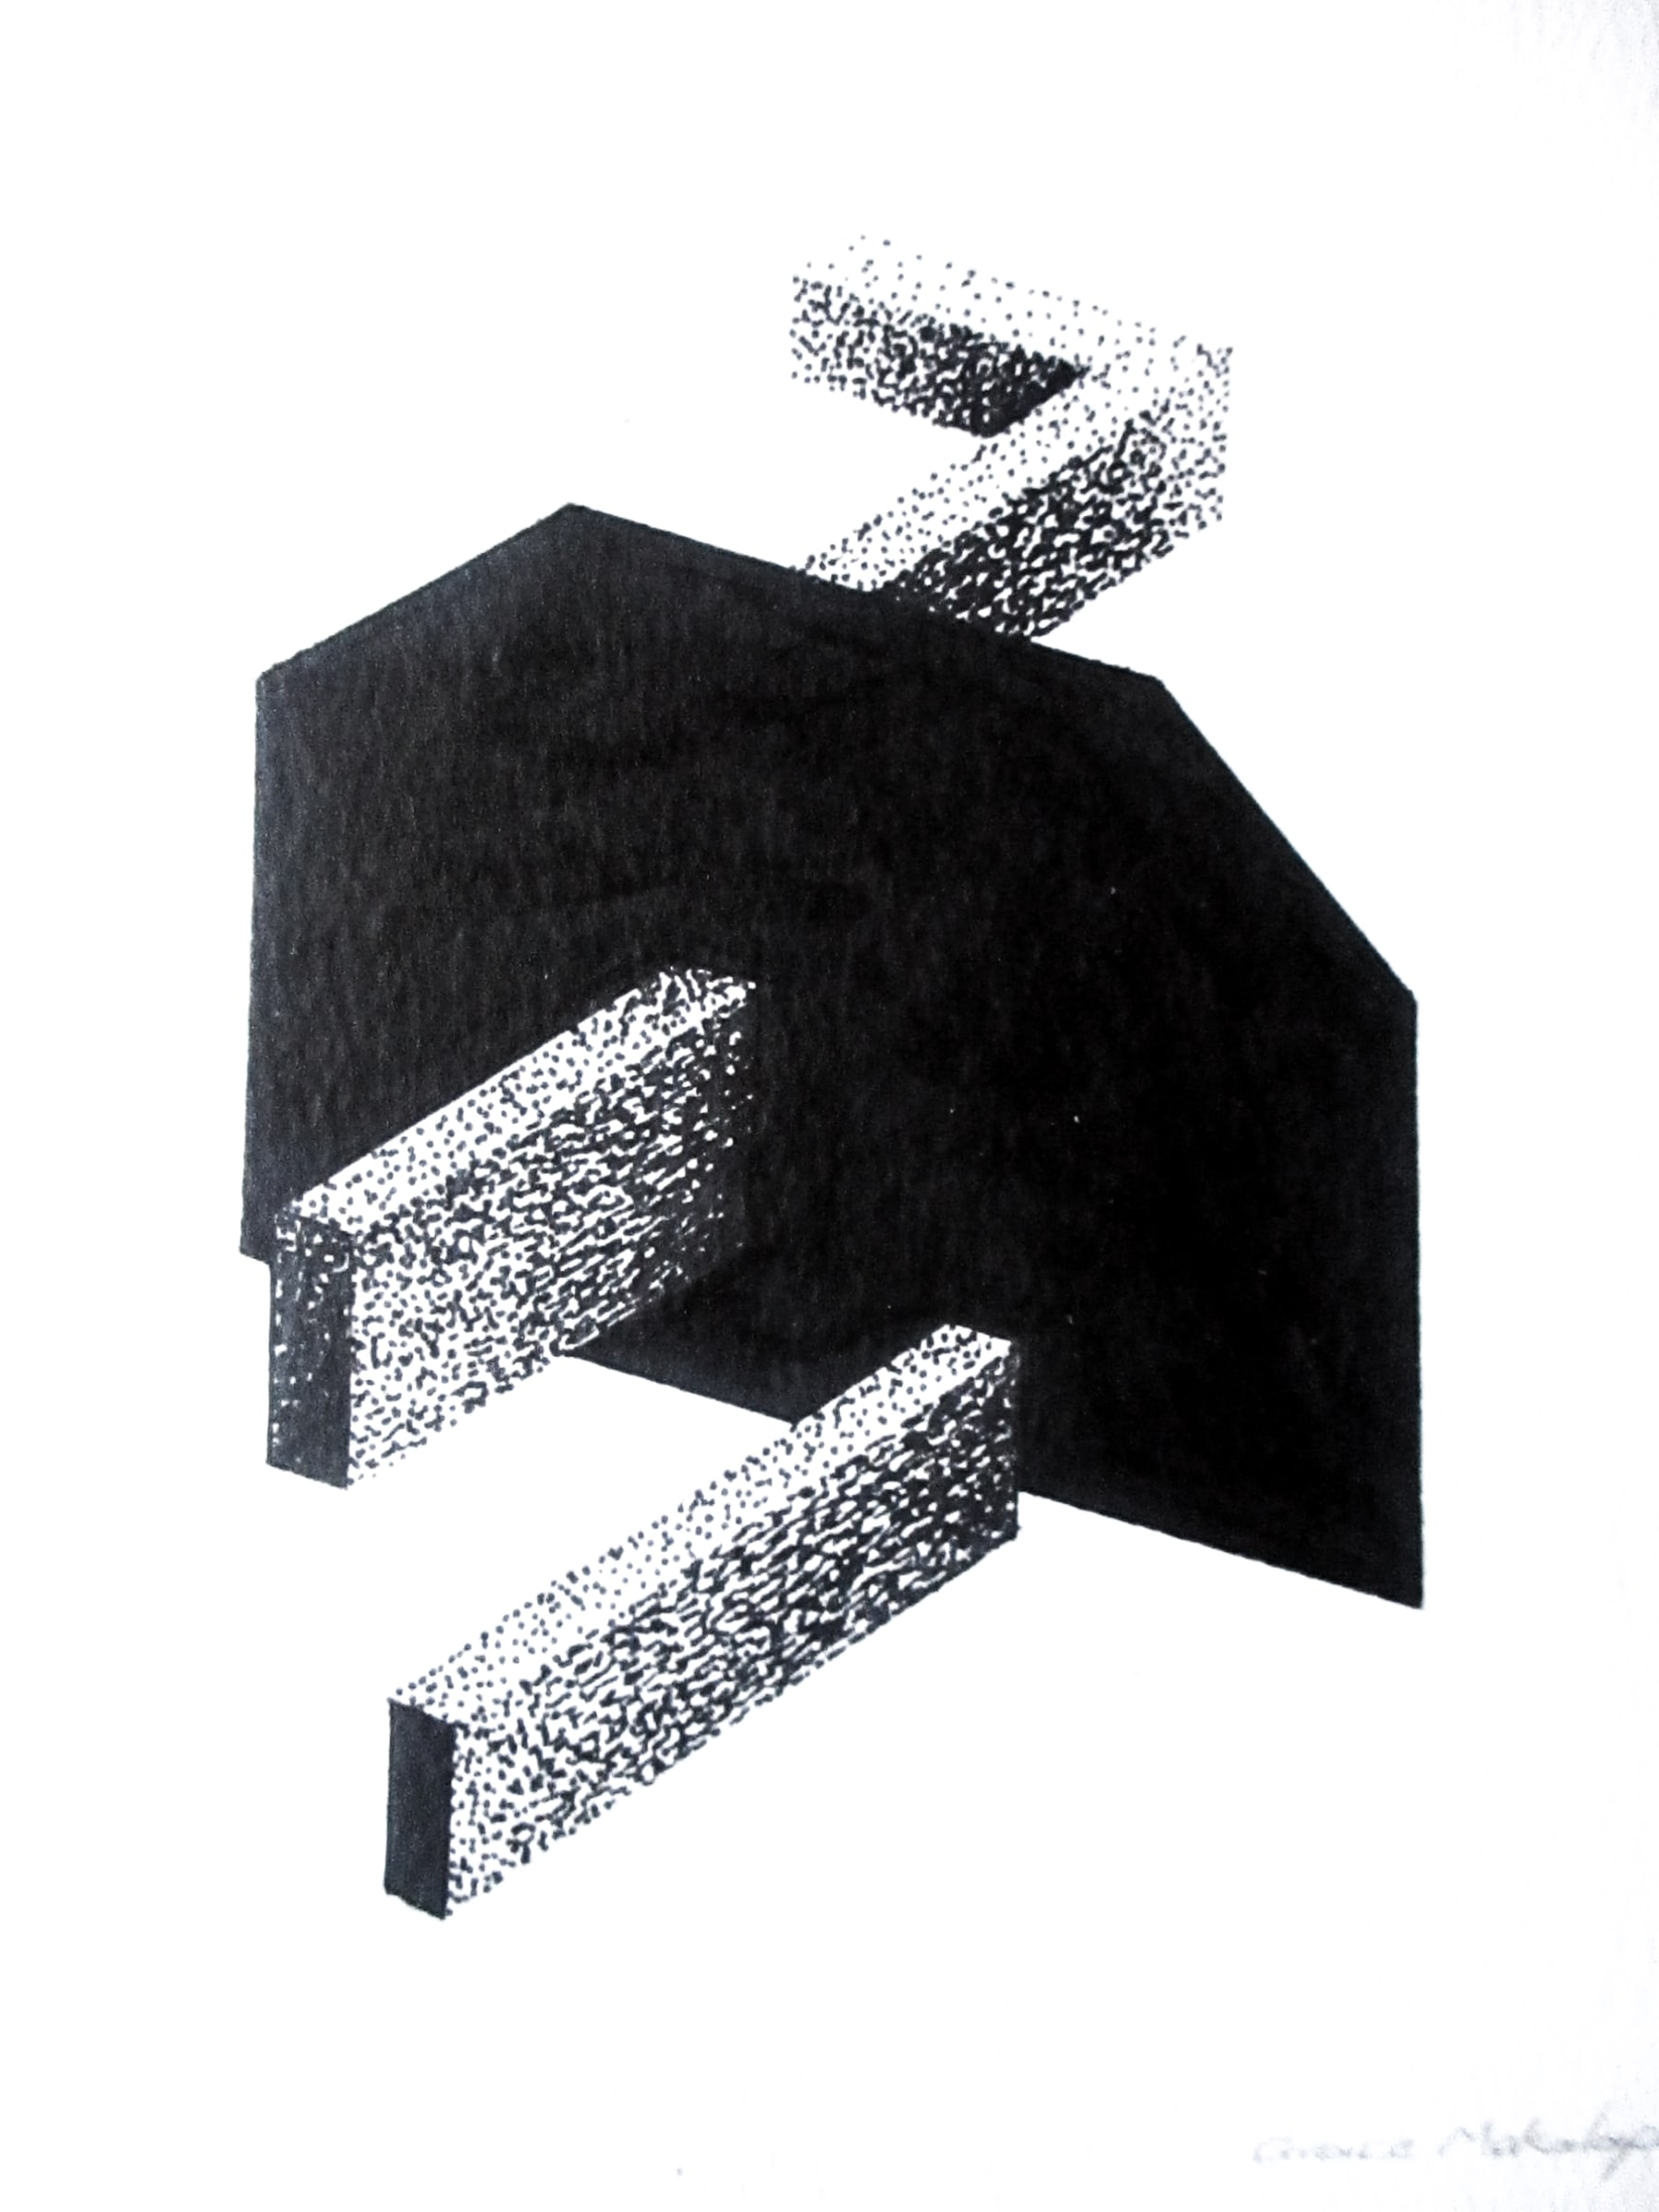 <span class=&#34;link fancybox-details-link&#34;><a href=&#34;/content/viewing-room/54/artworks2310/&#34;>View Detail Page</a></span><div class=&#34;medium&#34;>Ink On Watercolour Paper</div> <div class=&#34;dimensions&#34;>21cm x 14.8cm</div>